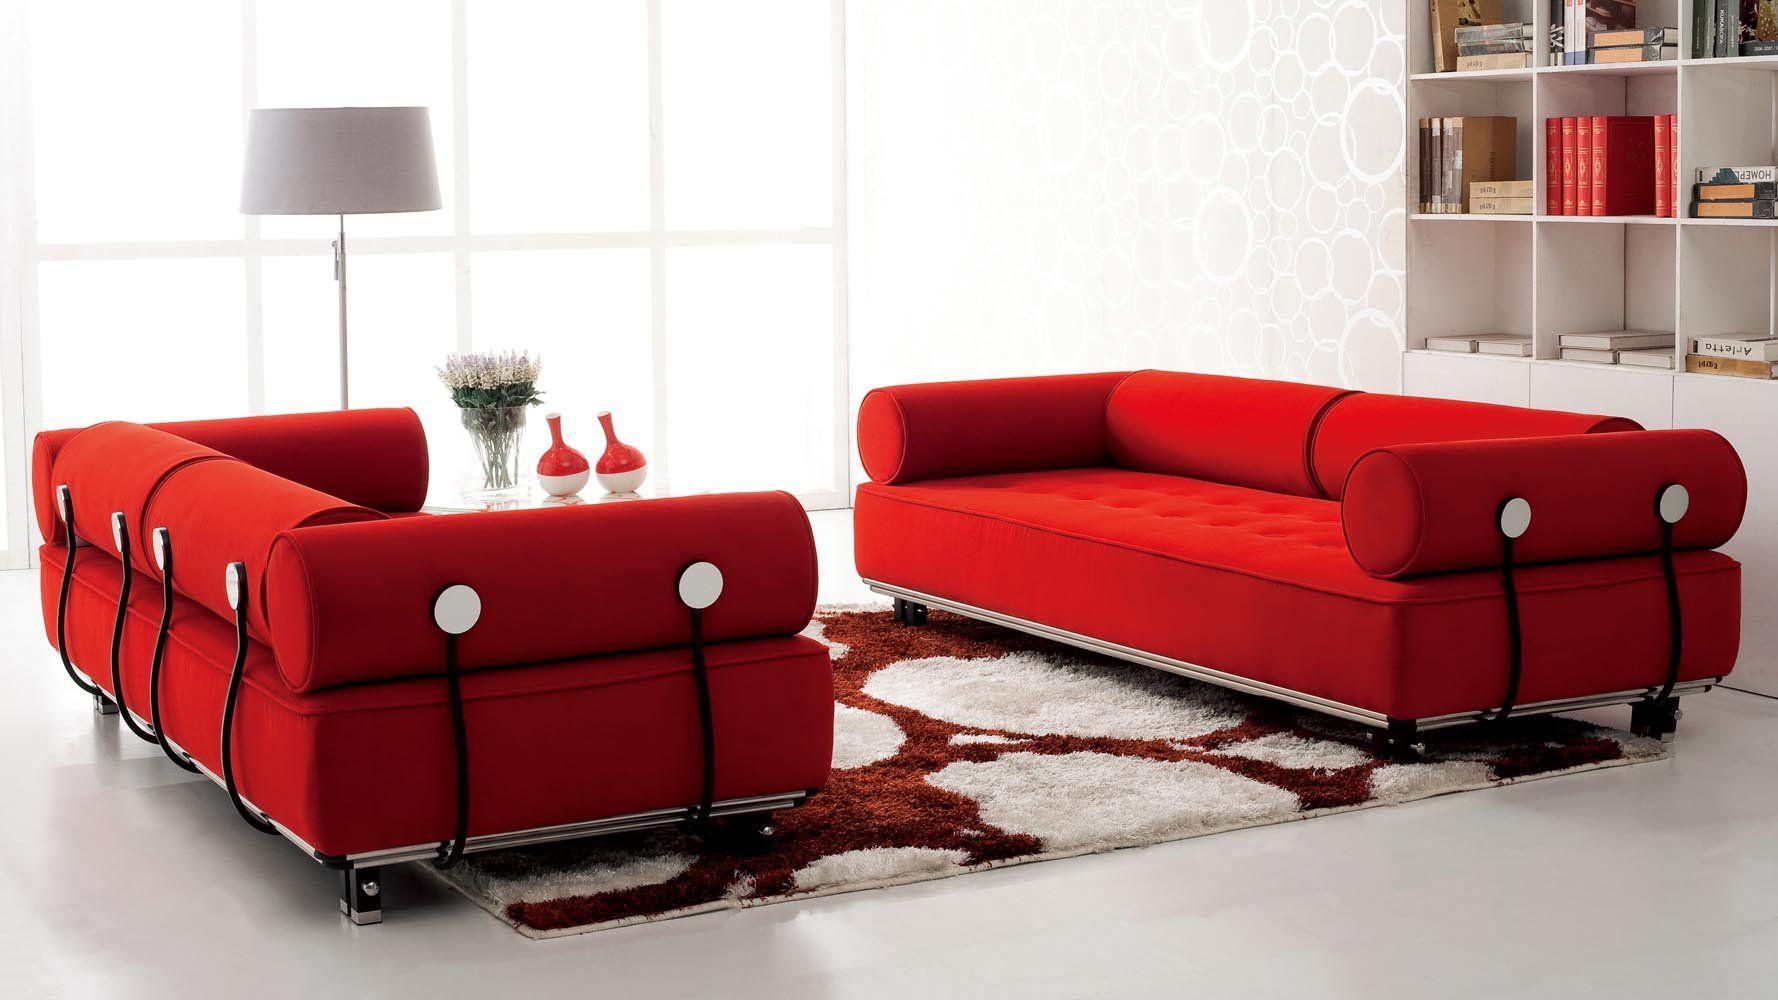 Amazing Carrera Modern Fabric Sofa Red Red Velvet Sofa Modern Fabric Sofa Contemporary Sofa Furniture